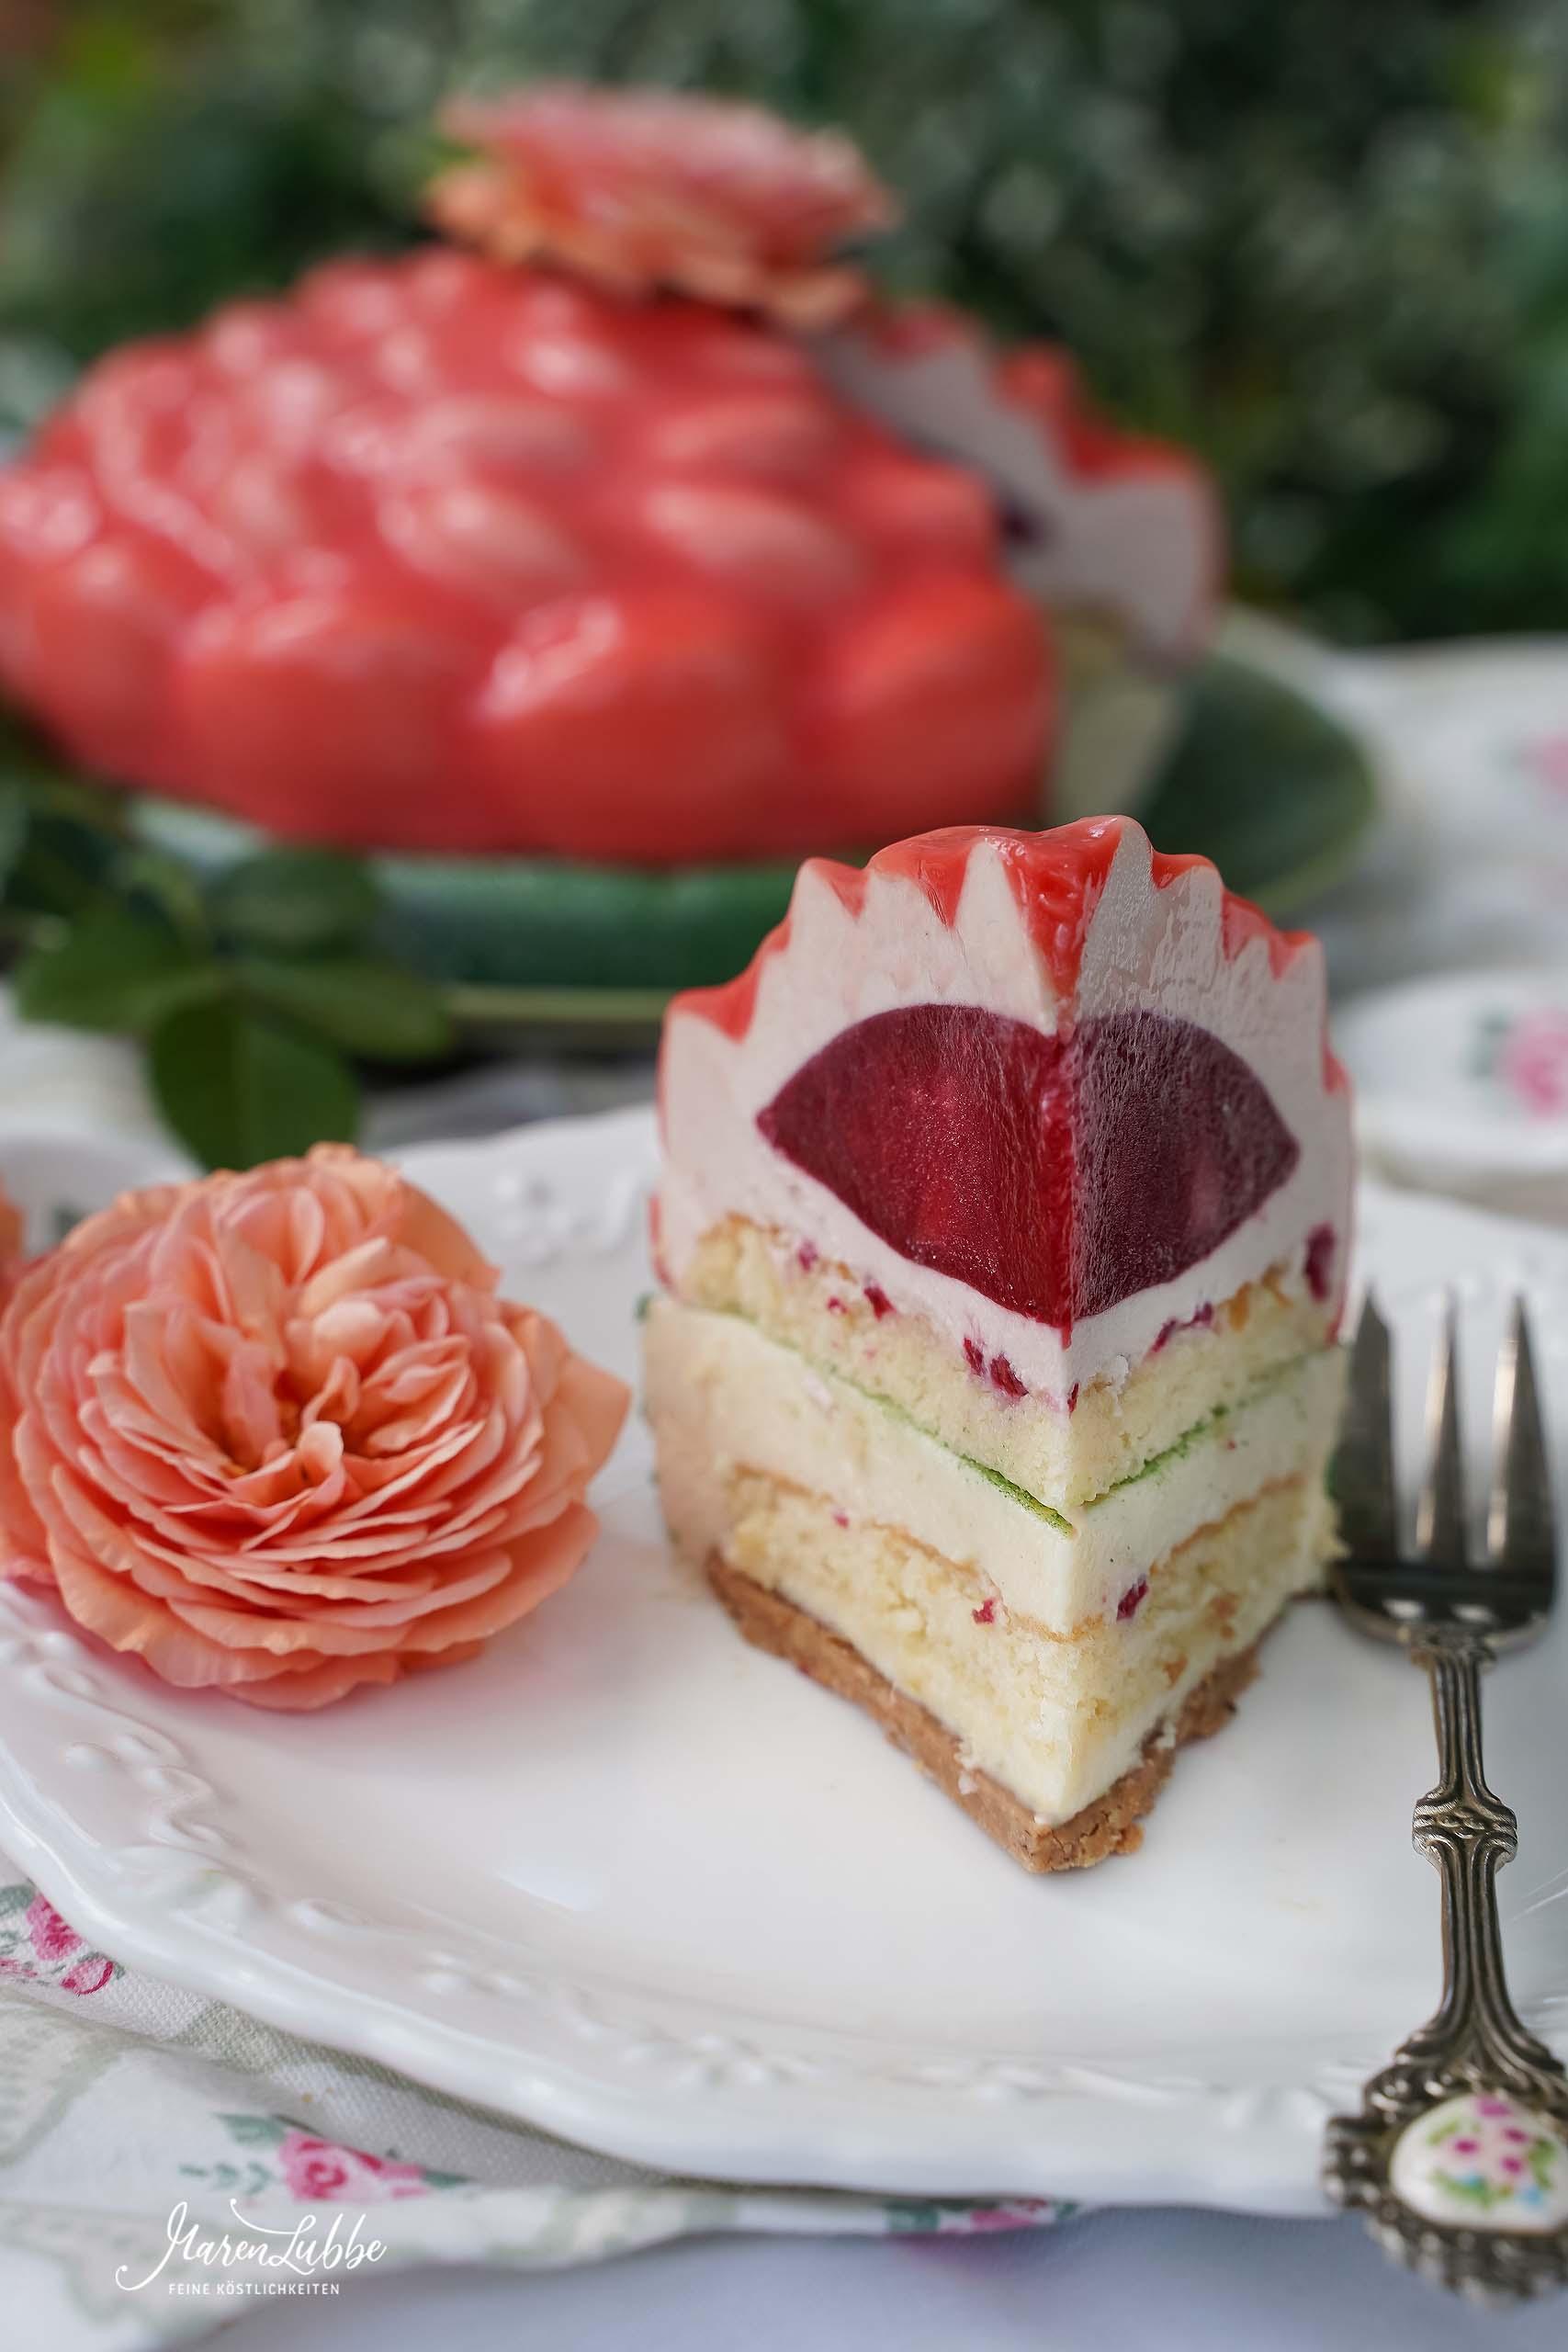 Peachy Rose Torte